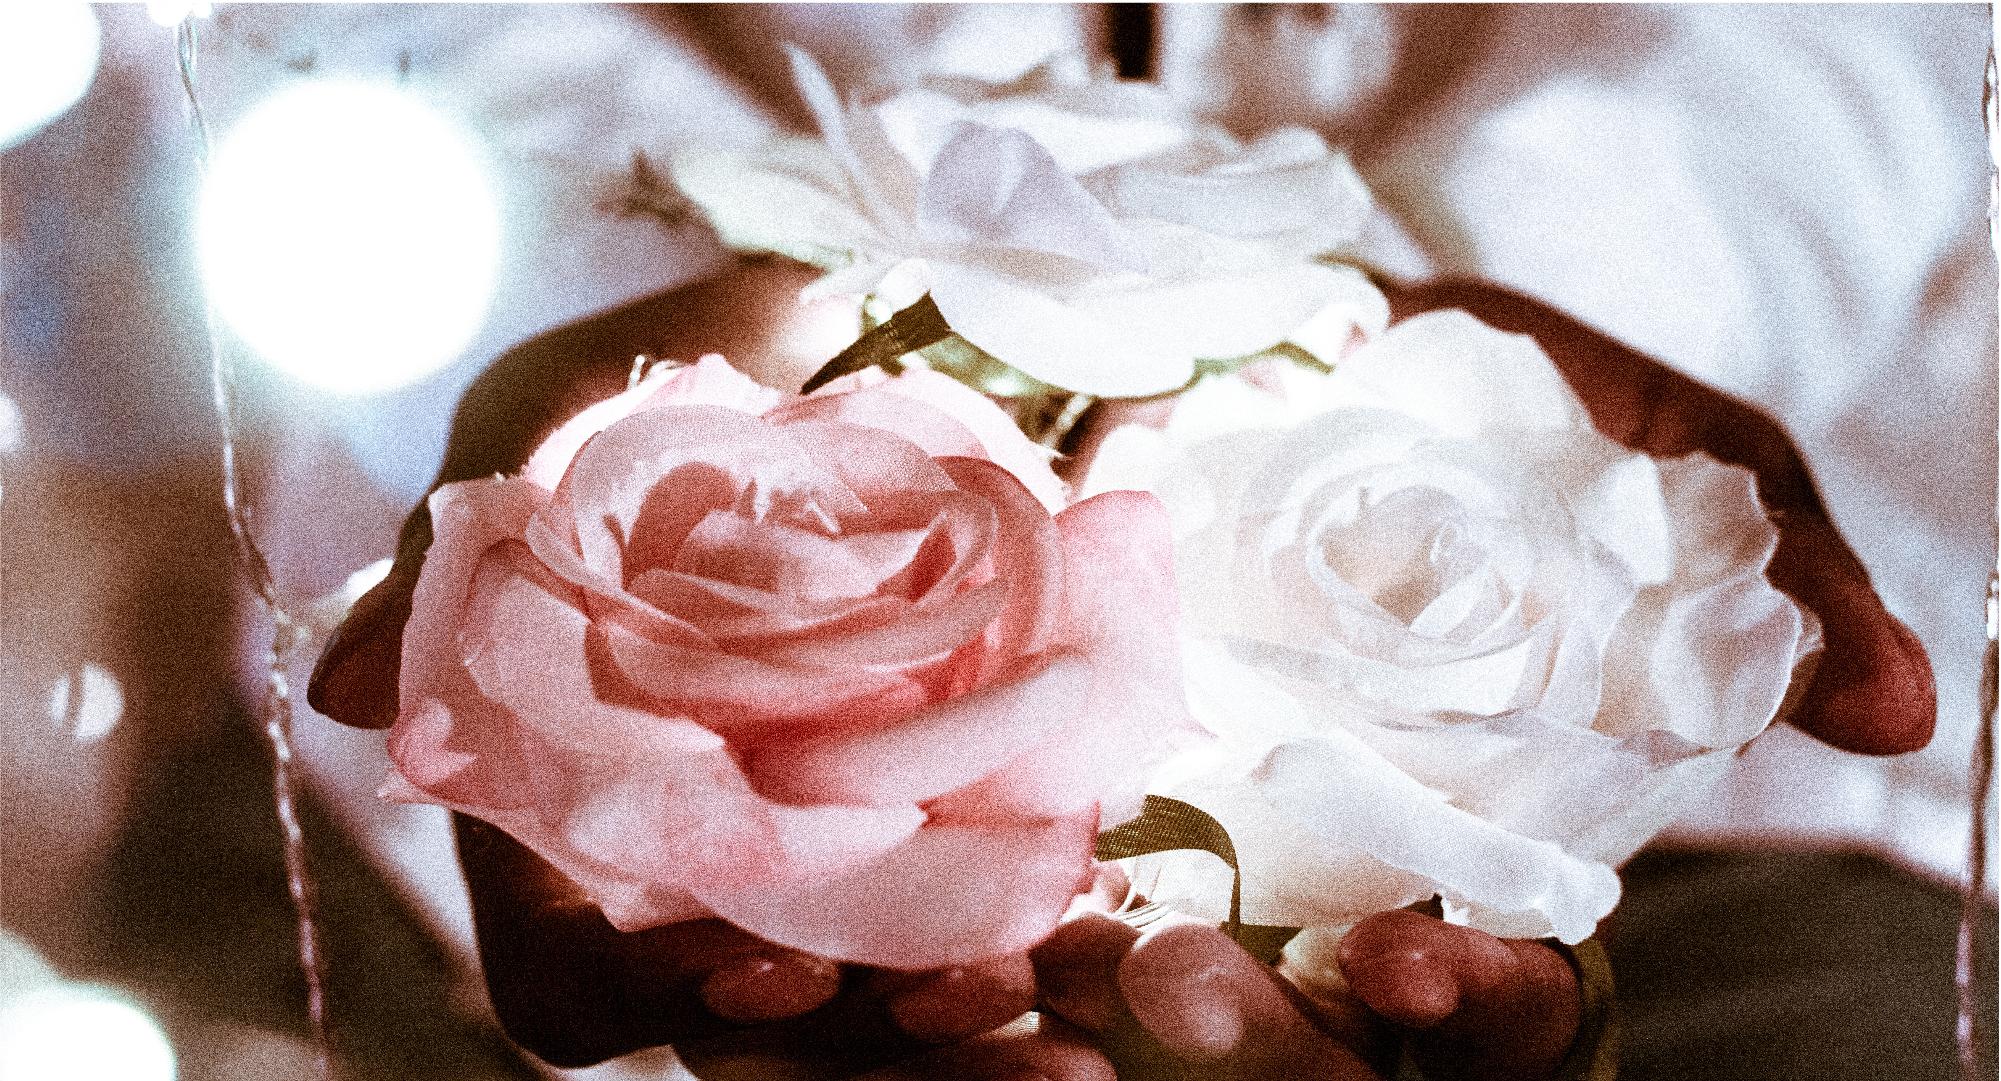 healthy skin is beautiful skin. -